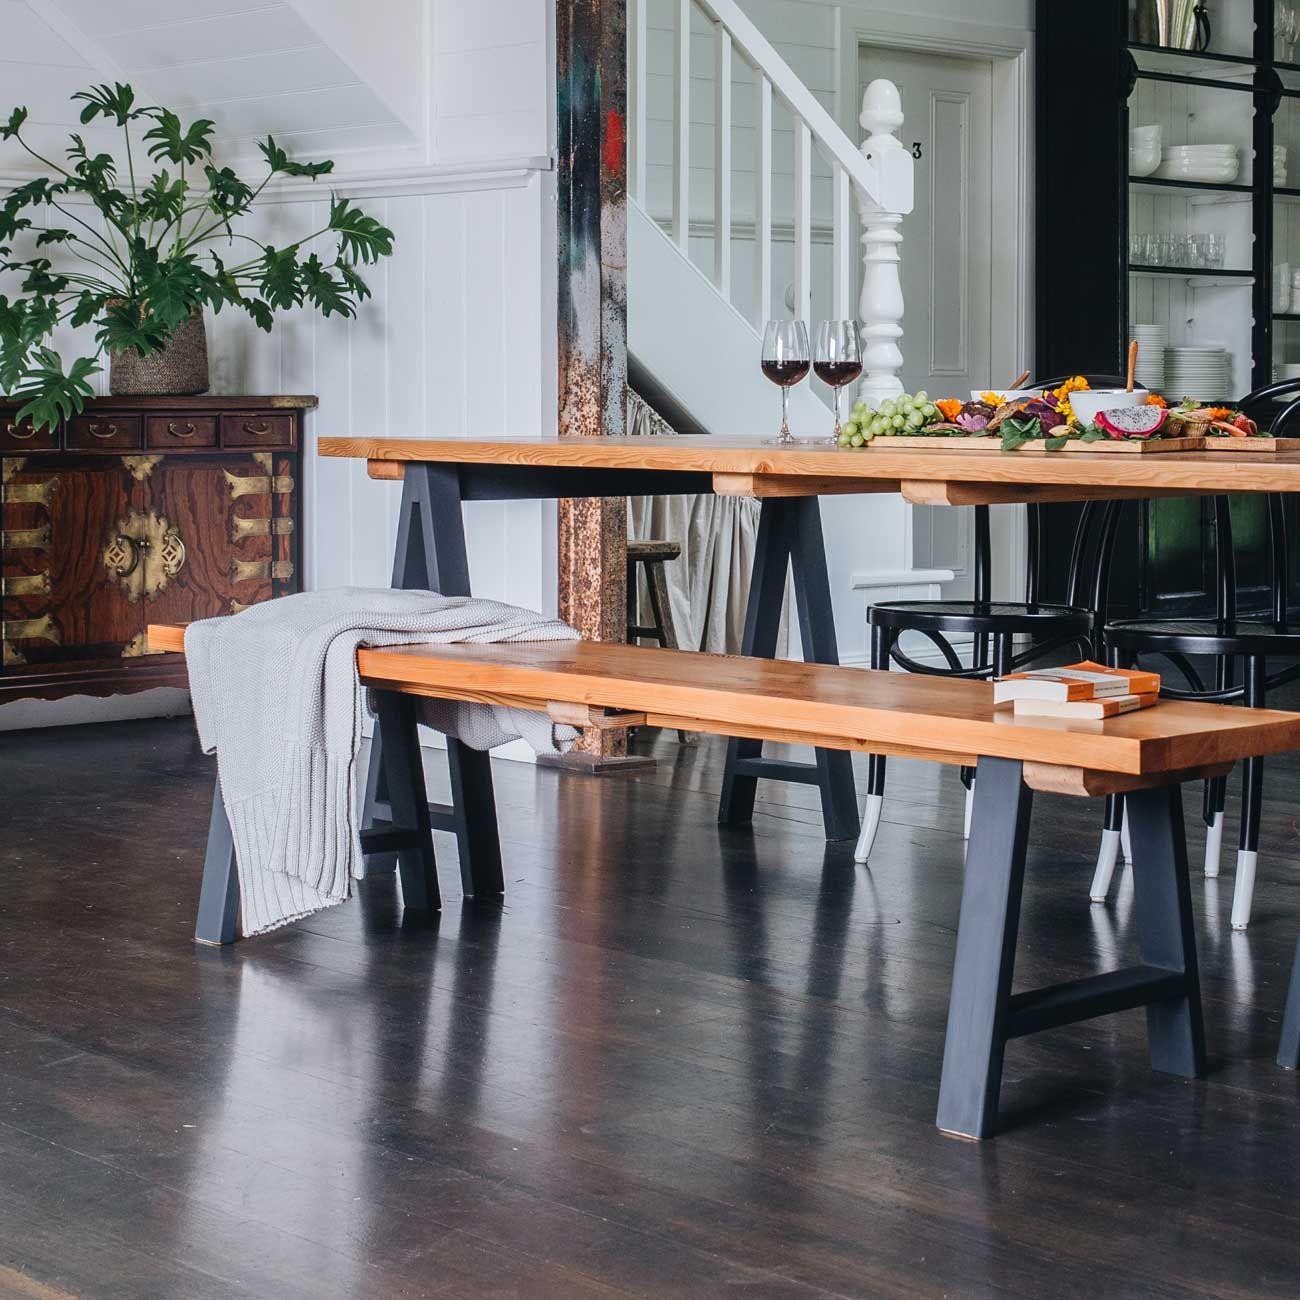 Small Trestle Dining Table 036 1 540 00 Ndash 036 2 670 00 Trestle Dining Tables Dining Table Dining Table Top